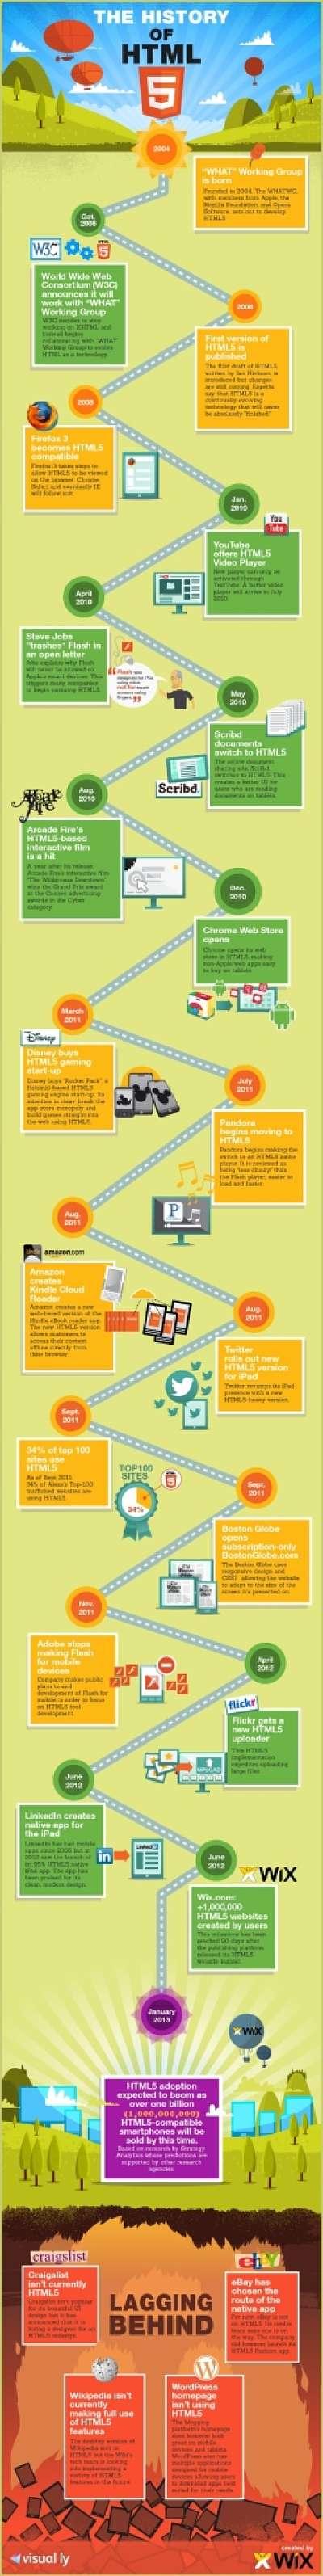 Actualidad Informática. Infografía: historia de HTML5. Rafael Barzanallana